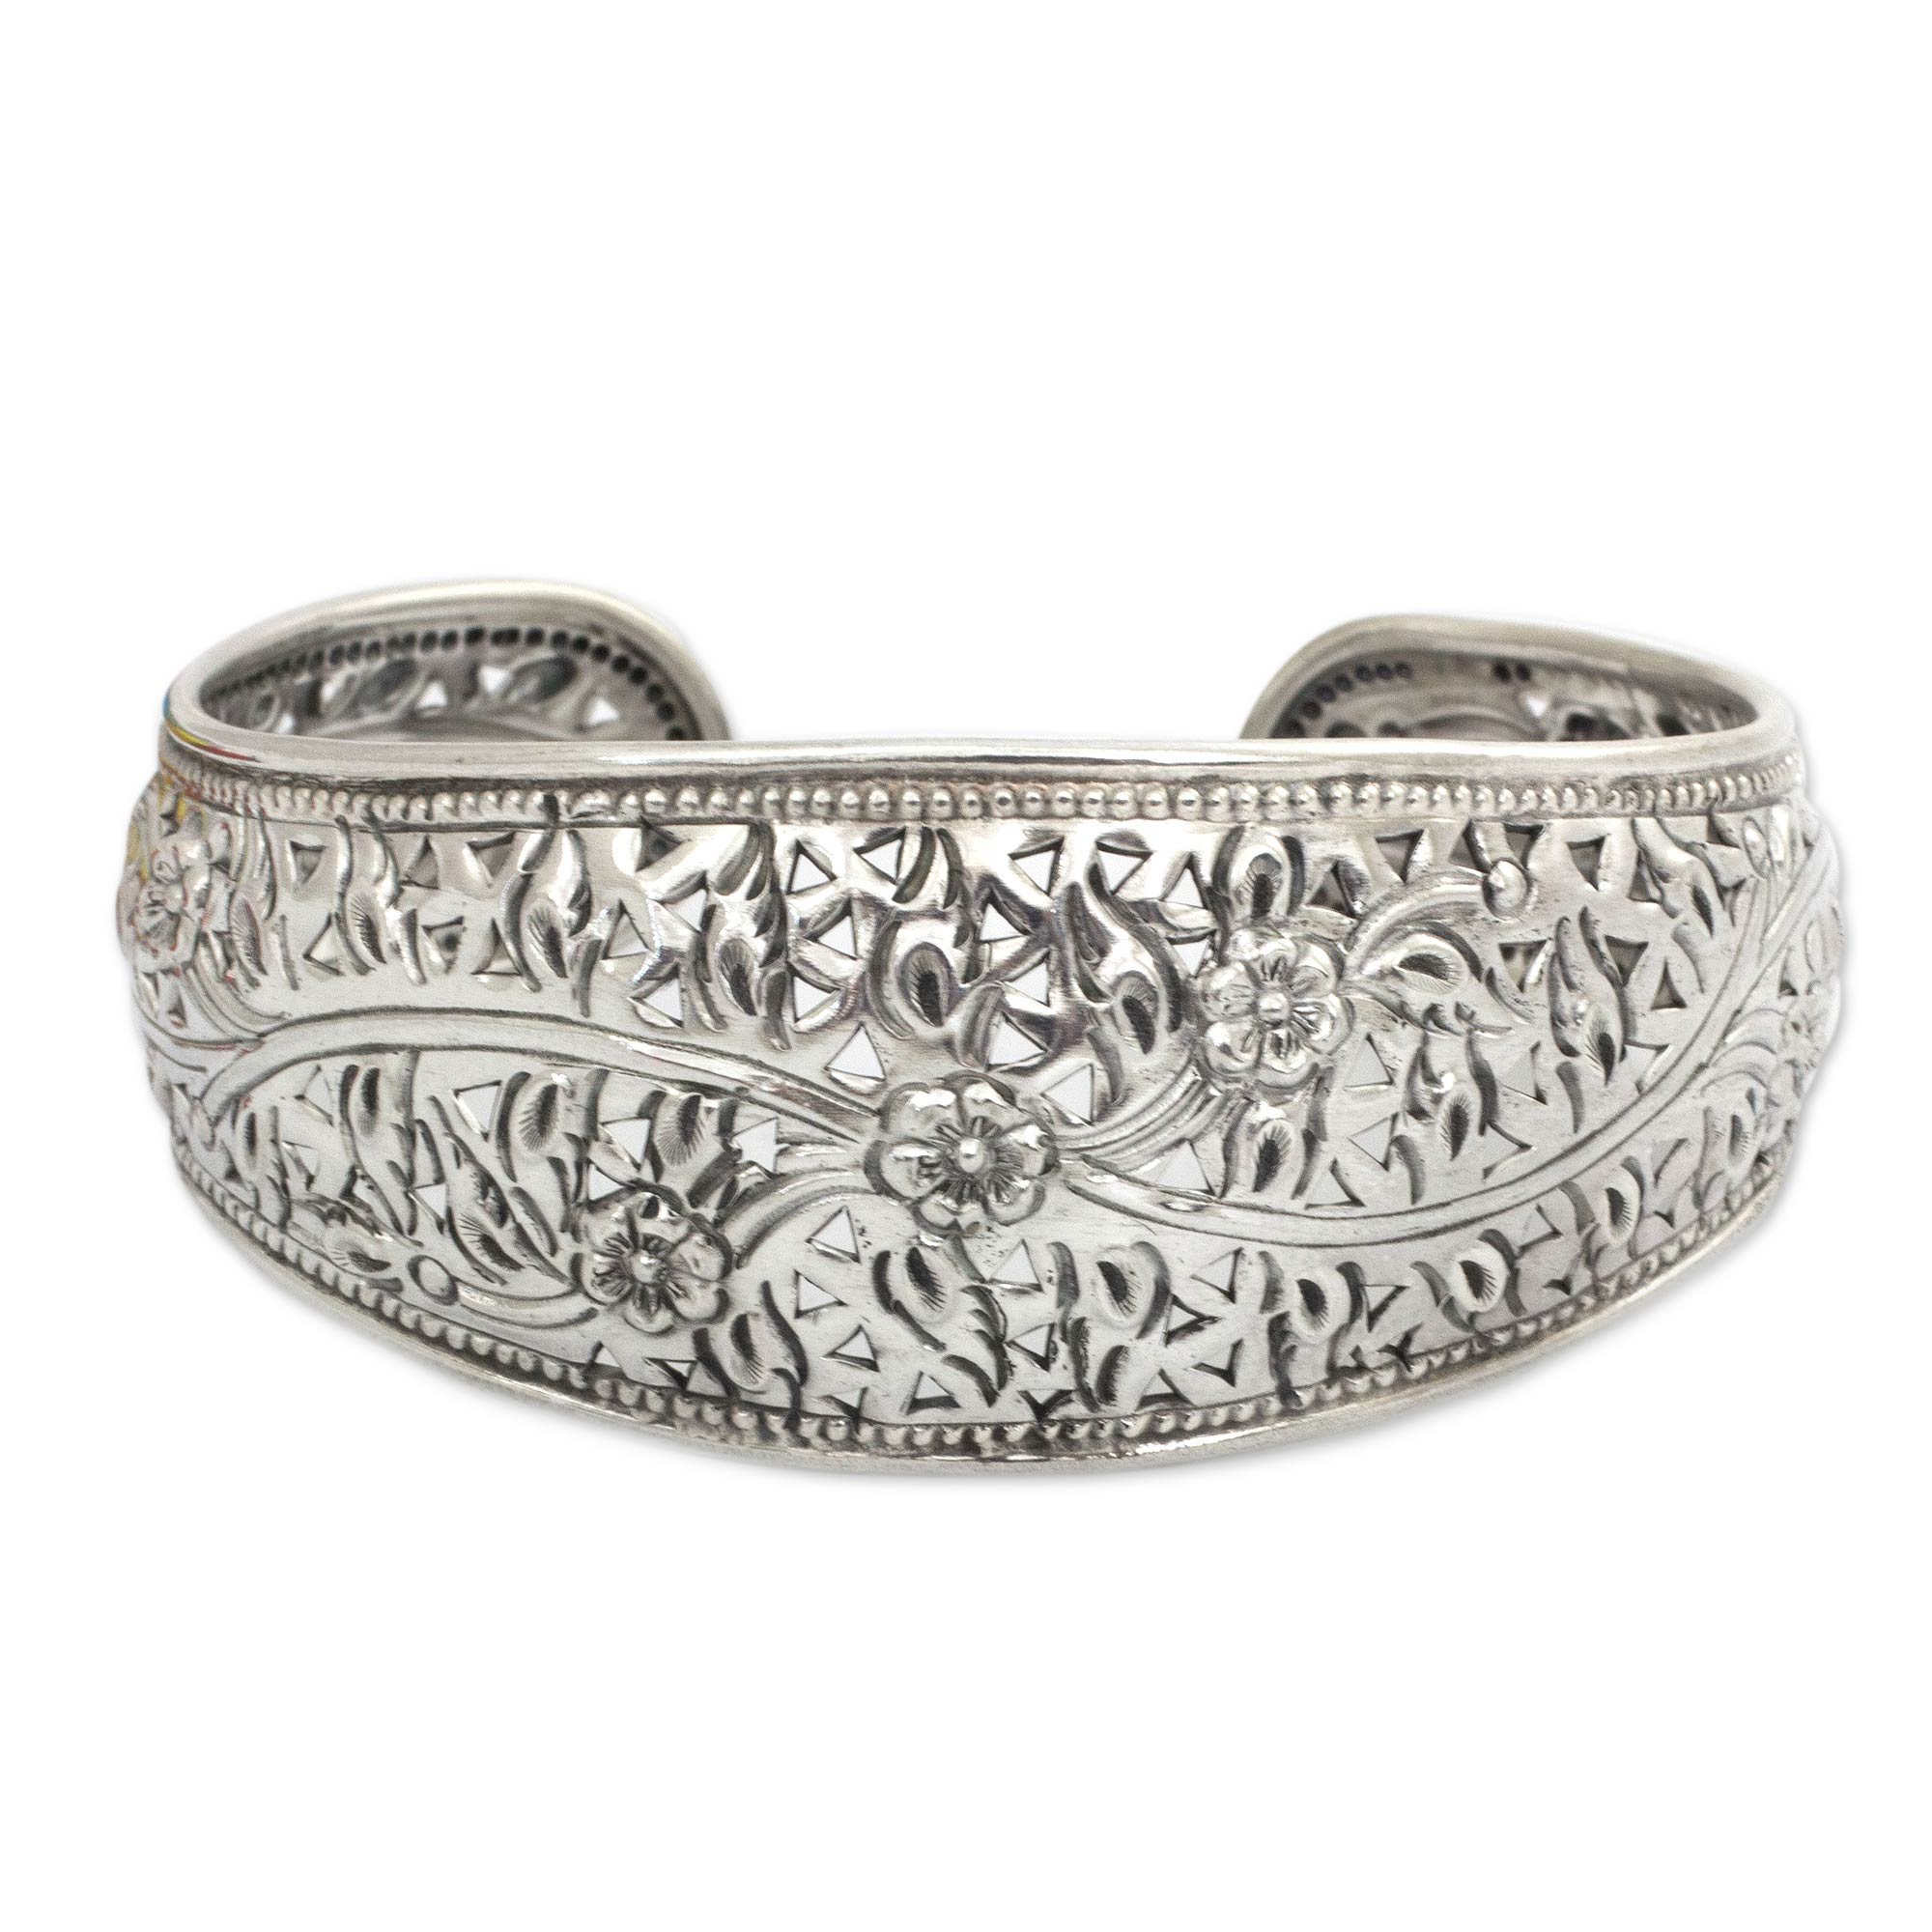 NOVICA Handmade Floral 925 Sterling Silver Cuff Bracelet, 6.5'', 'Sweet Jasmine'